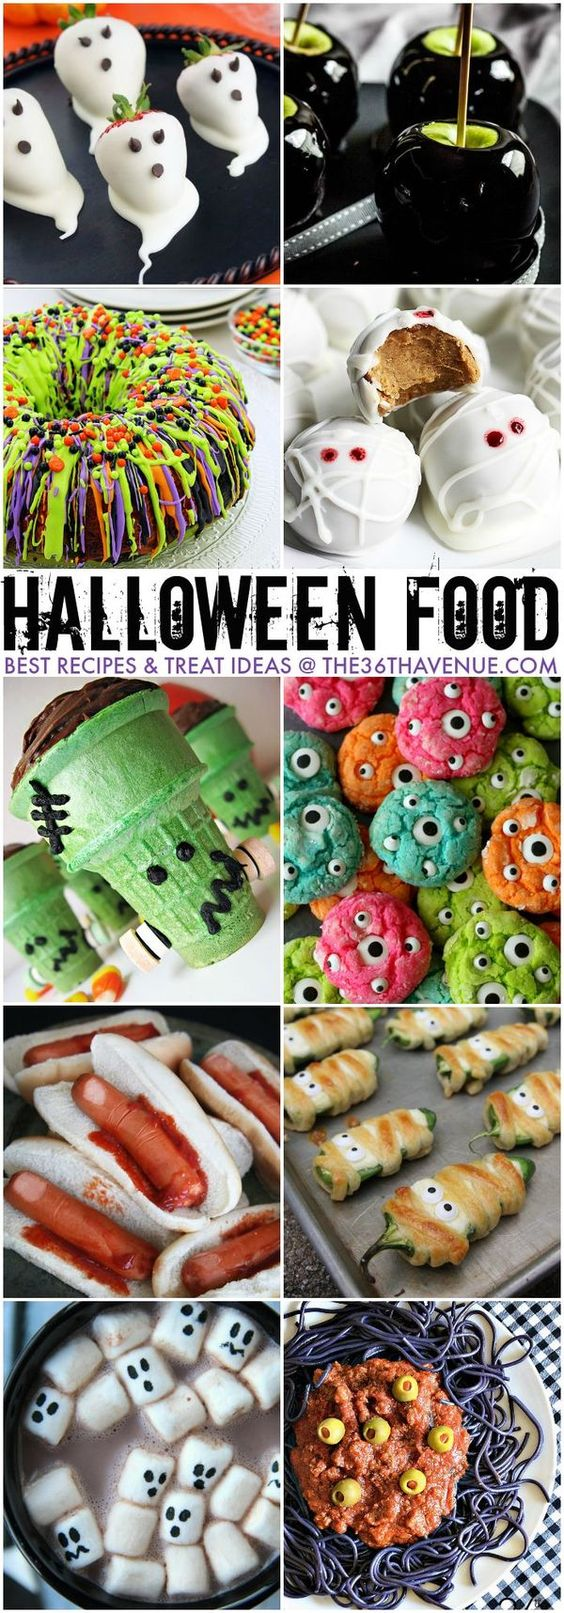 Halloween best treats and recipes creative awesome for Creative ideas for halloween treats